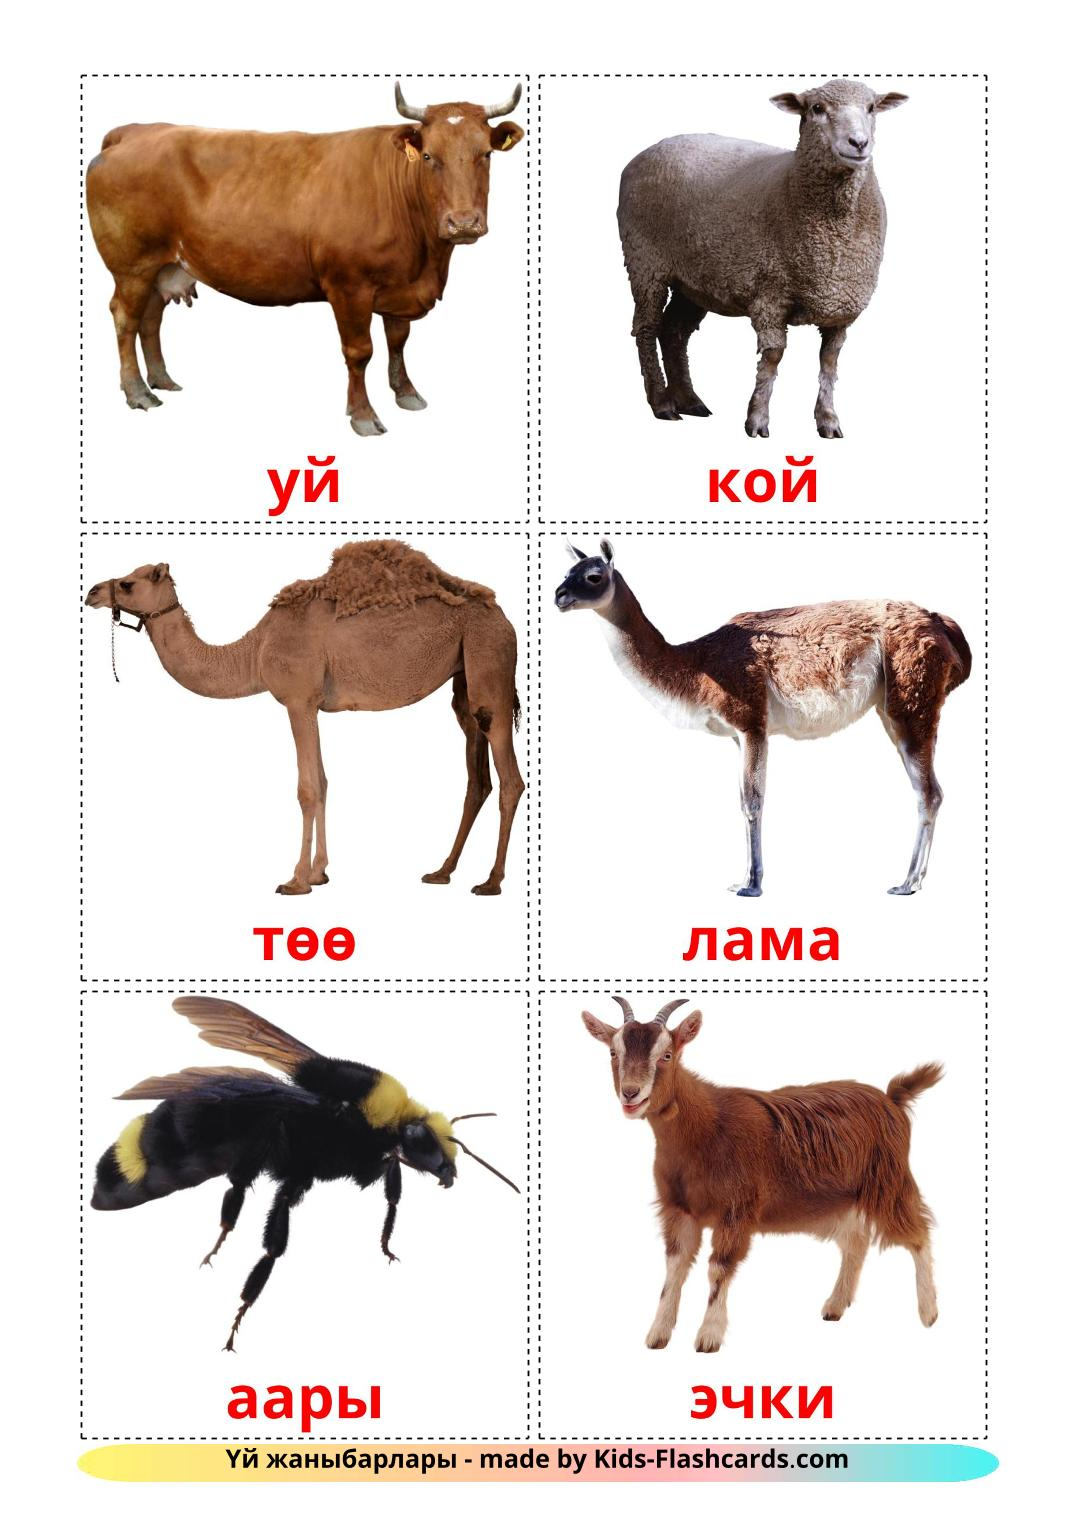 Farm animals - 15 Free Printable kyrgyz Flashcards